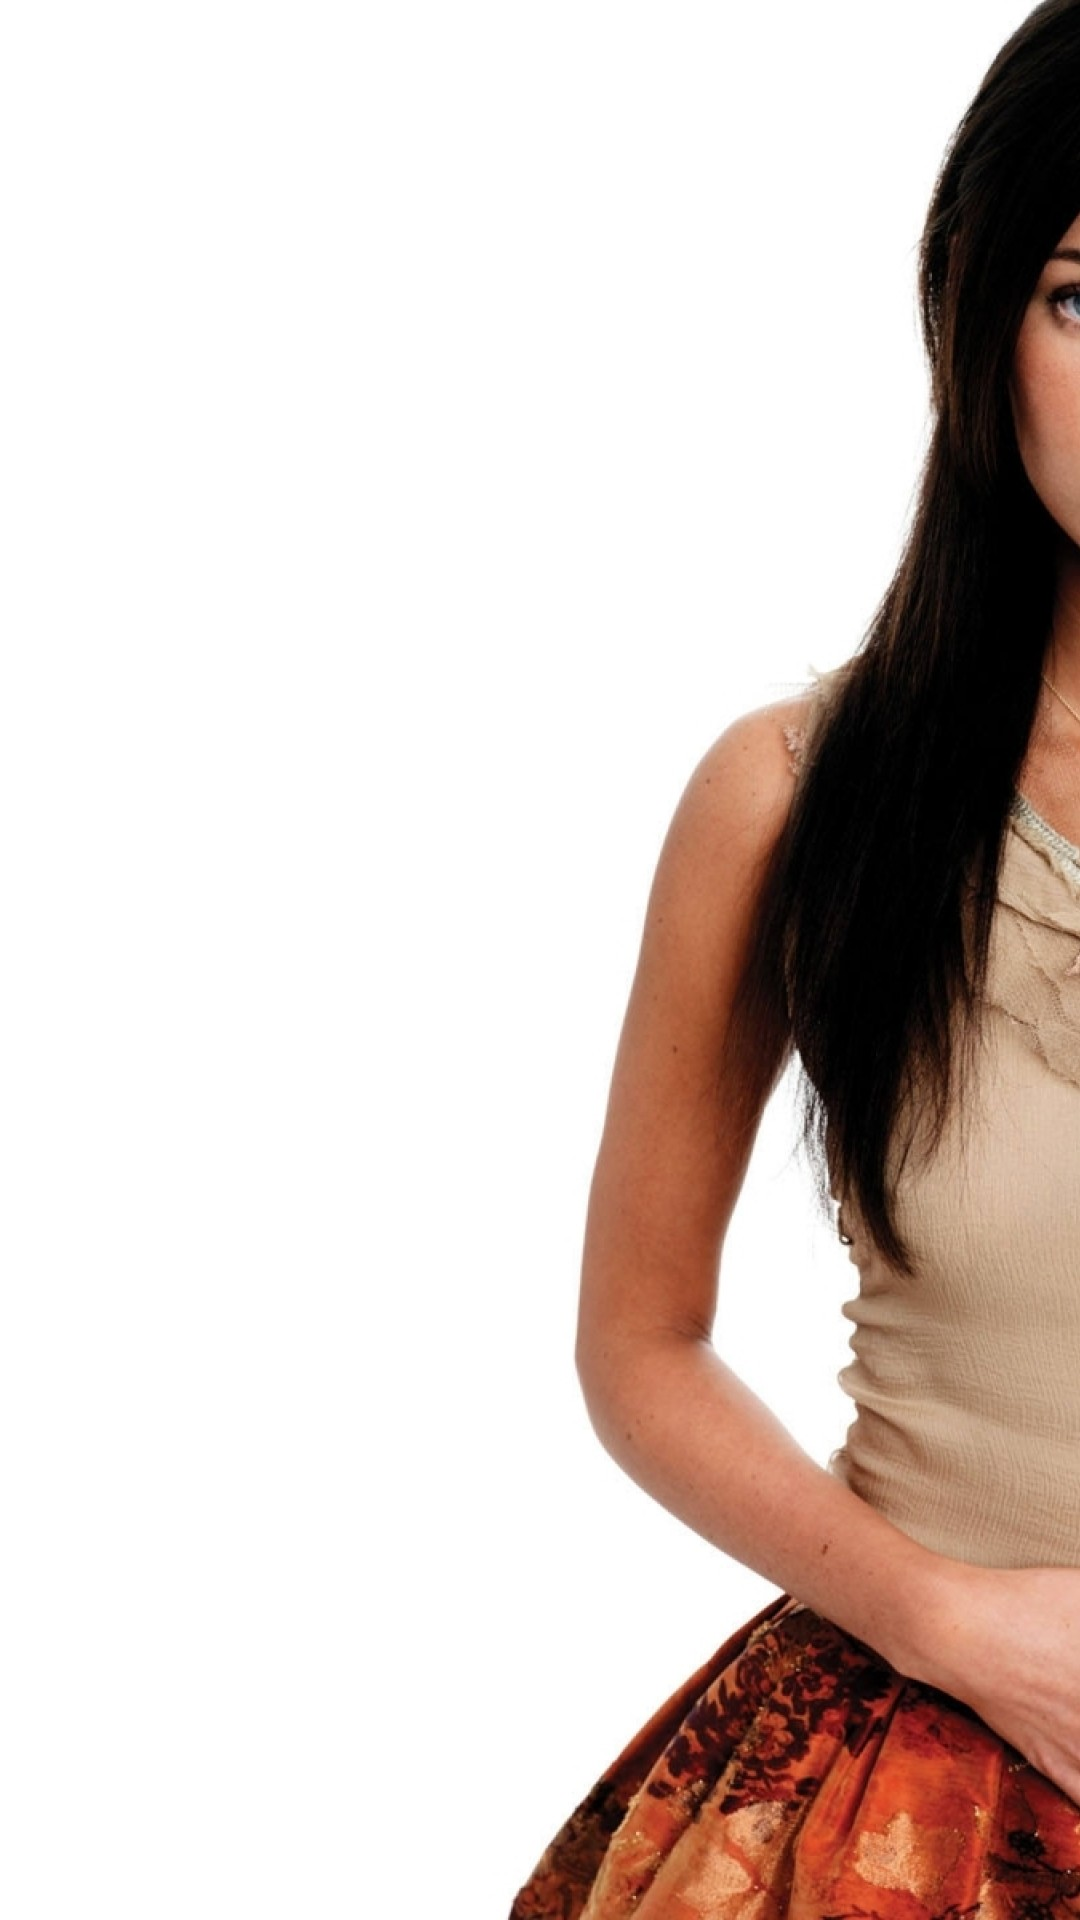 Megan Fox Hd Wallpaper Iphone 6 6s Plus Hd Wallpaper